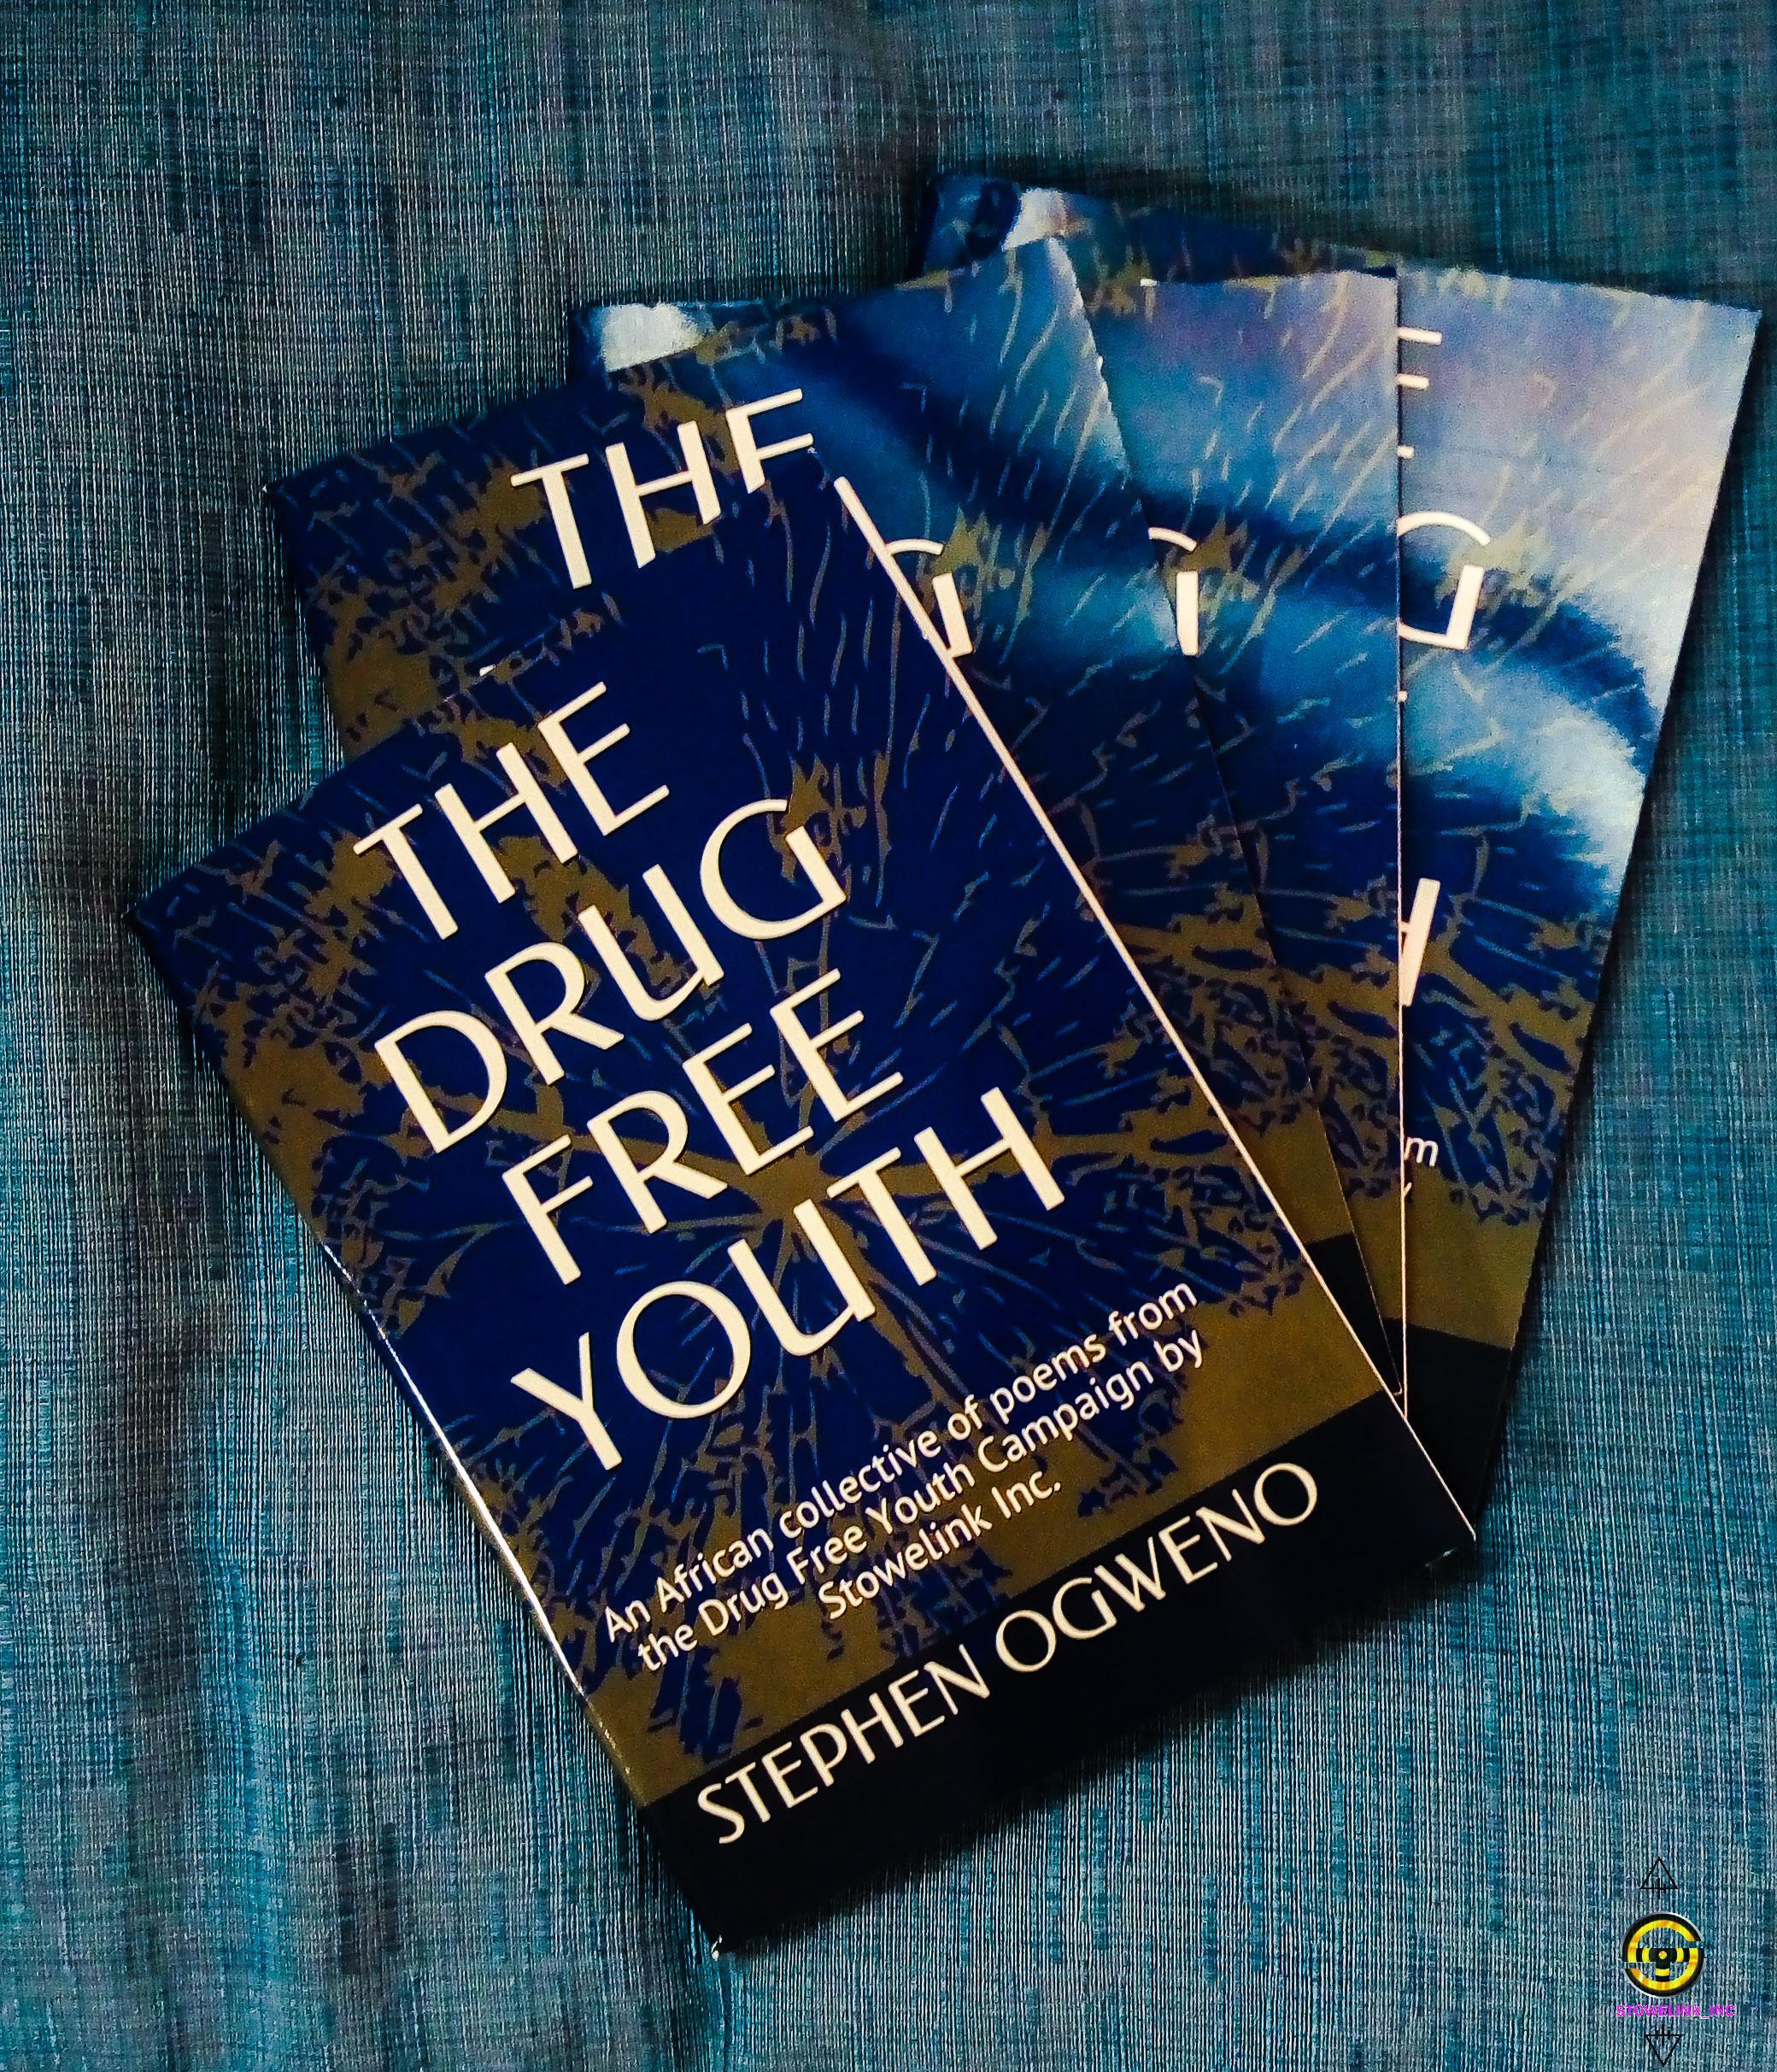 Books written by Stephen Ogweno